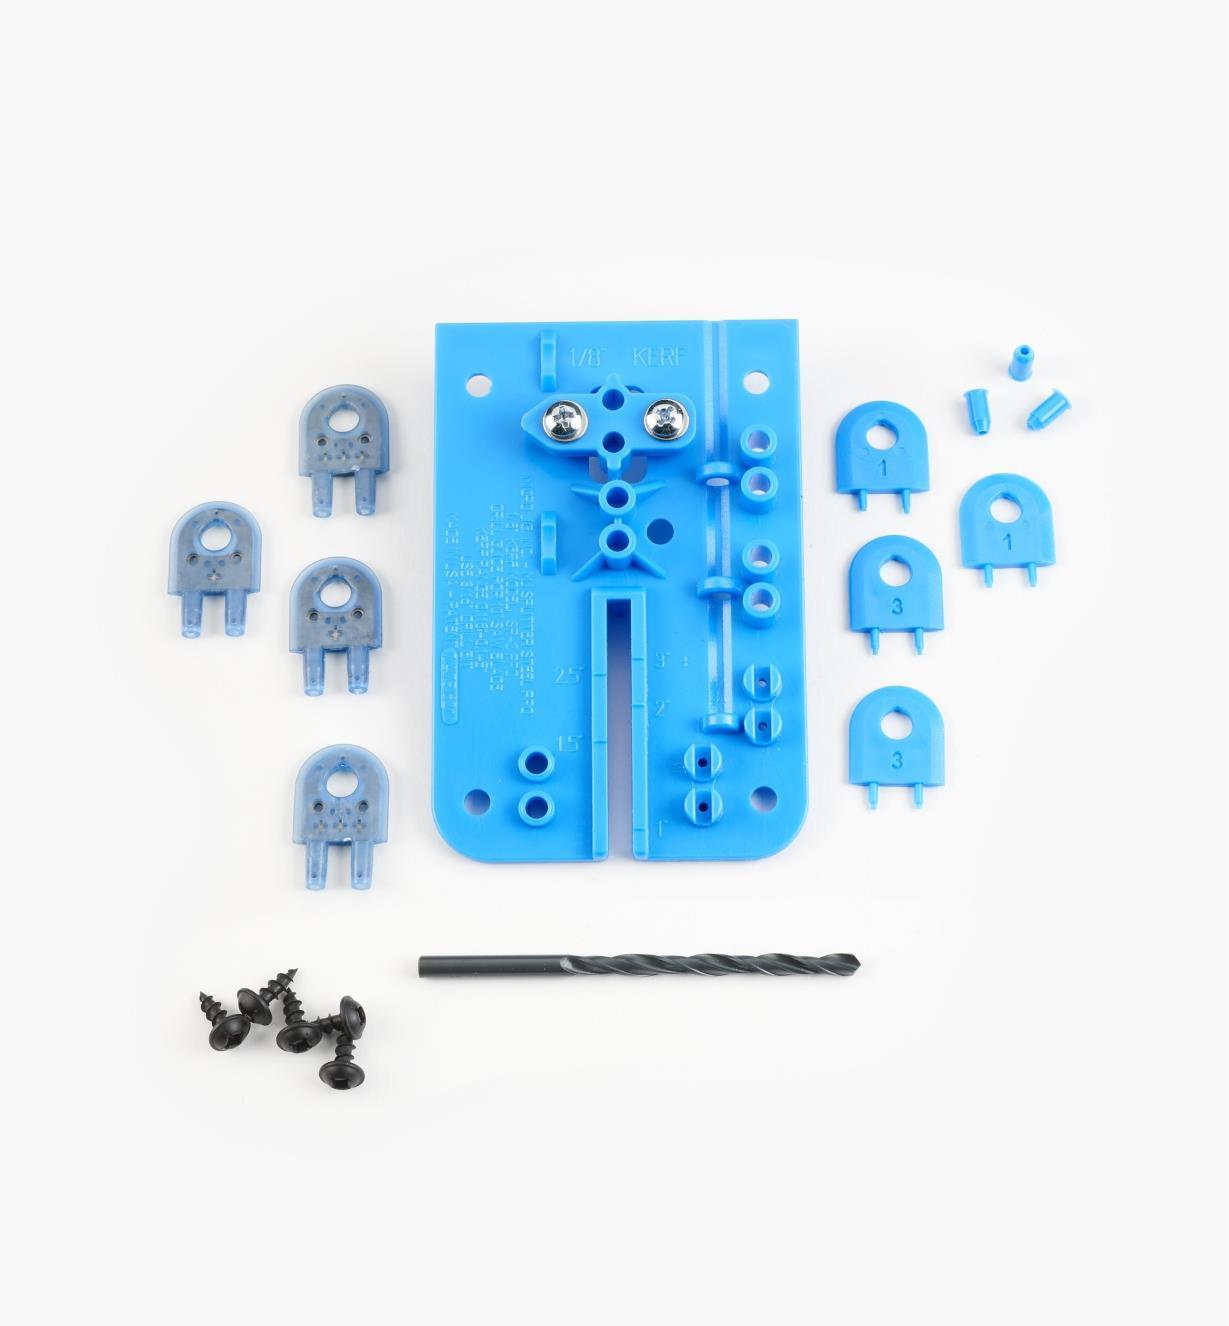 03J8025 - MicroJig Pro Splitter, Regular